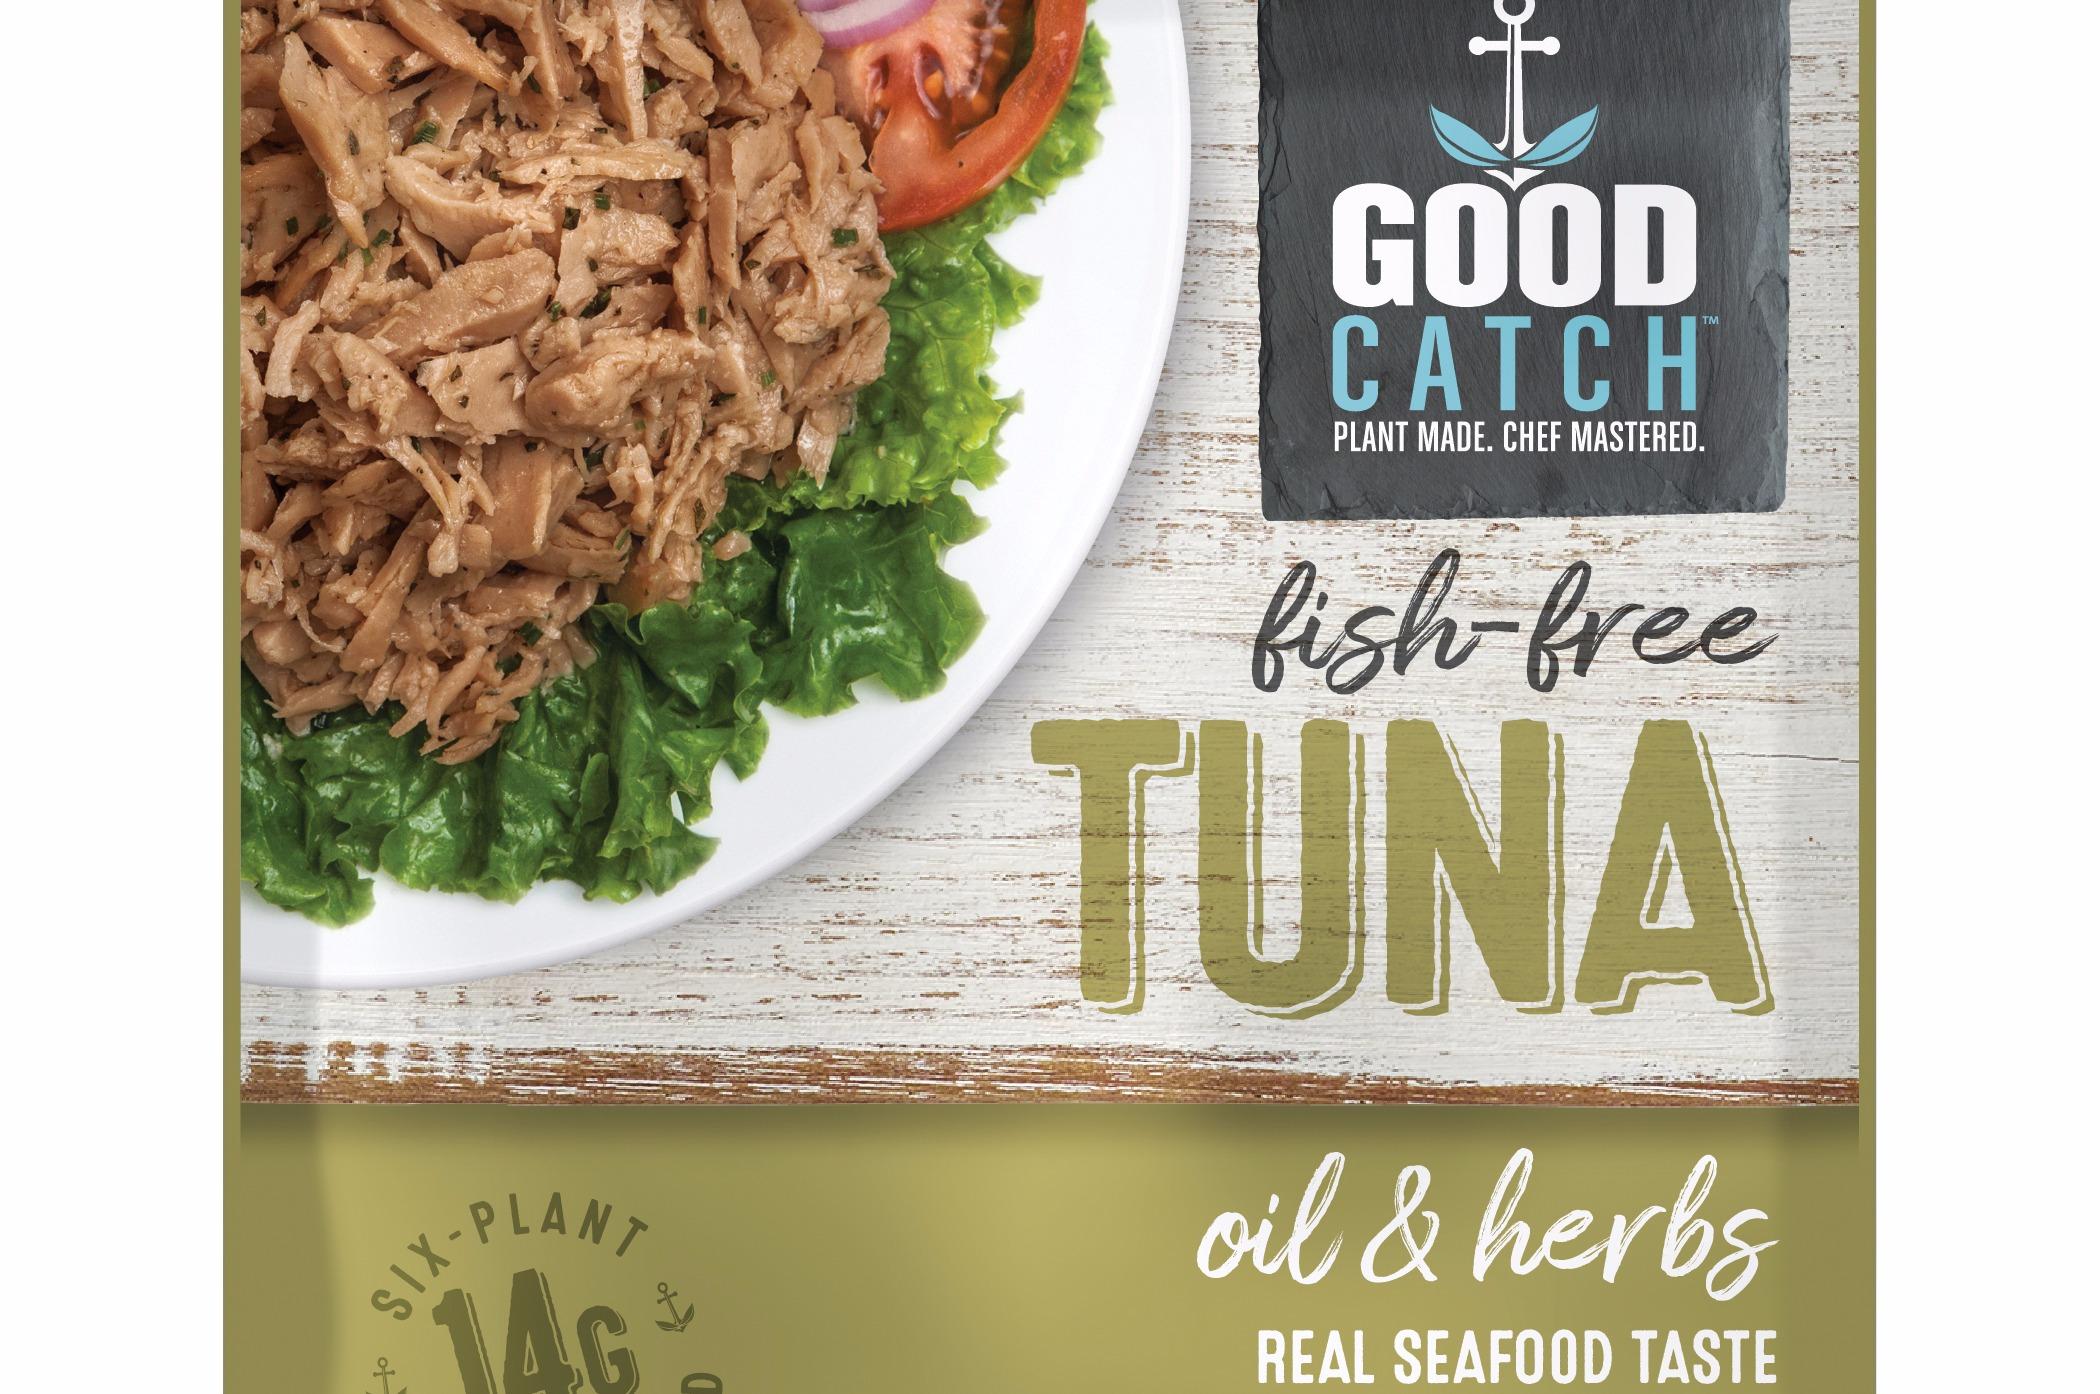 Good Catch Fish-Free Tuna, Oil & Herbs